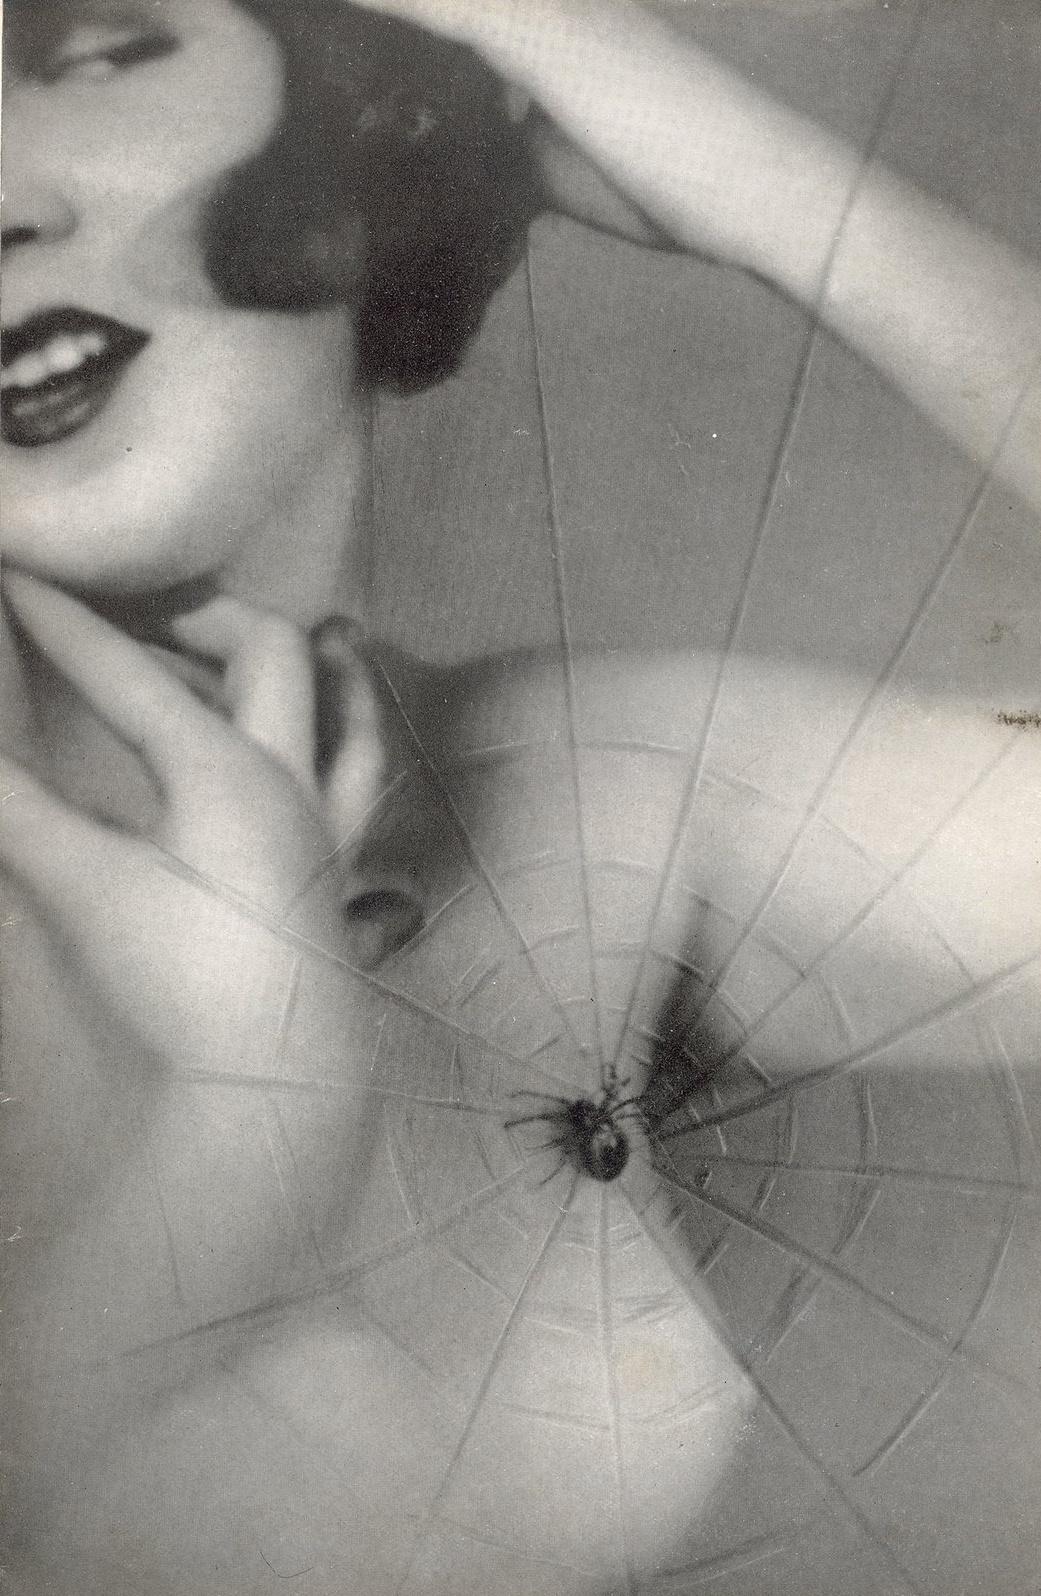 Studio Manassé - Nude with spider's web , 1930